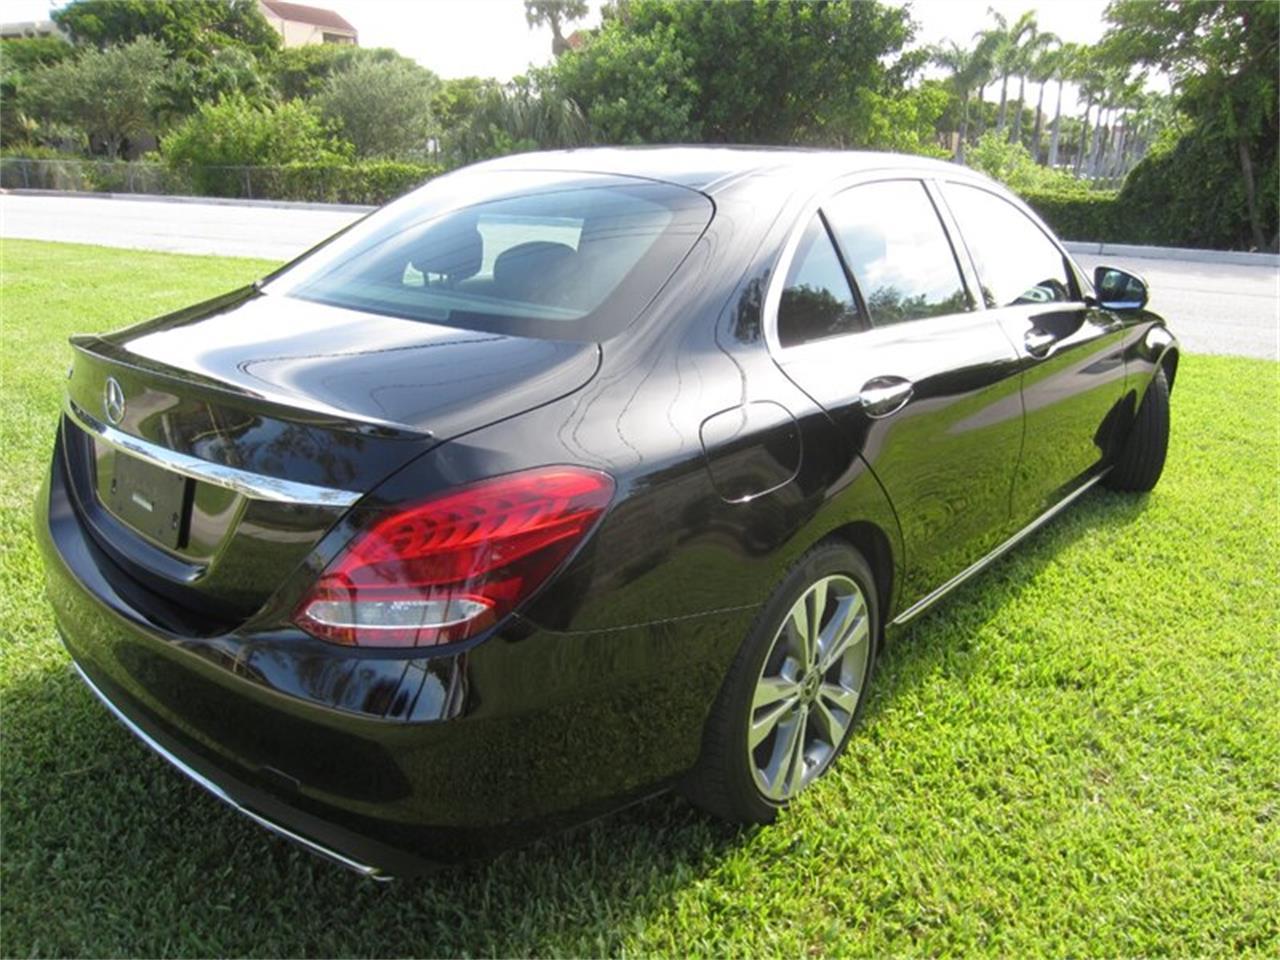 2018 Mercedes-Benz 300C (CC-1363721) for sale in Delray Beach, Florida